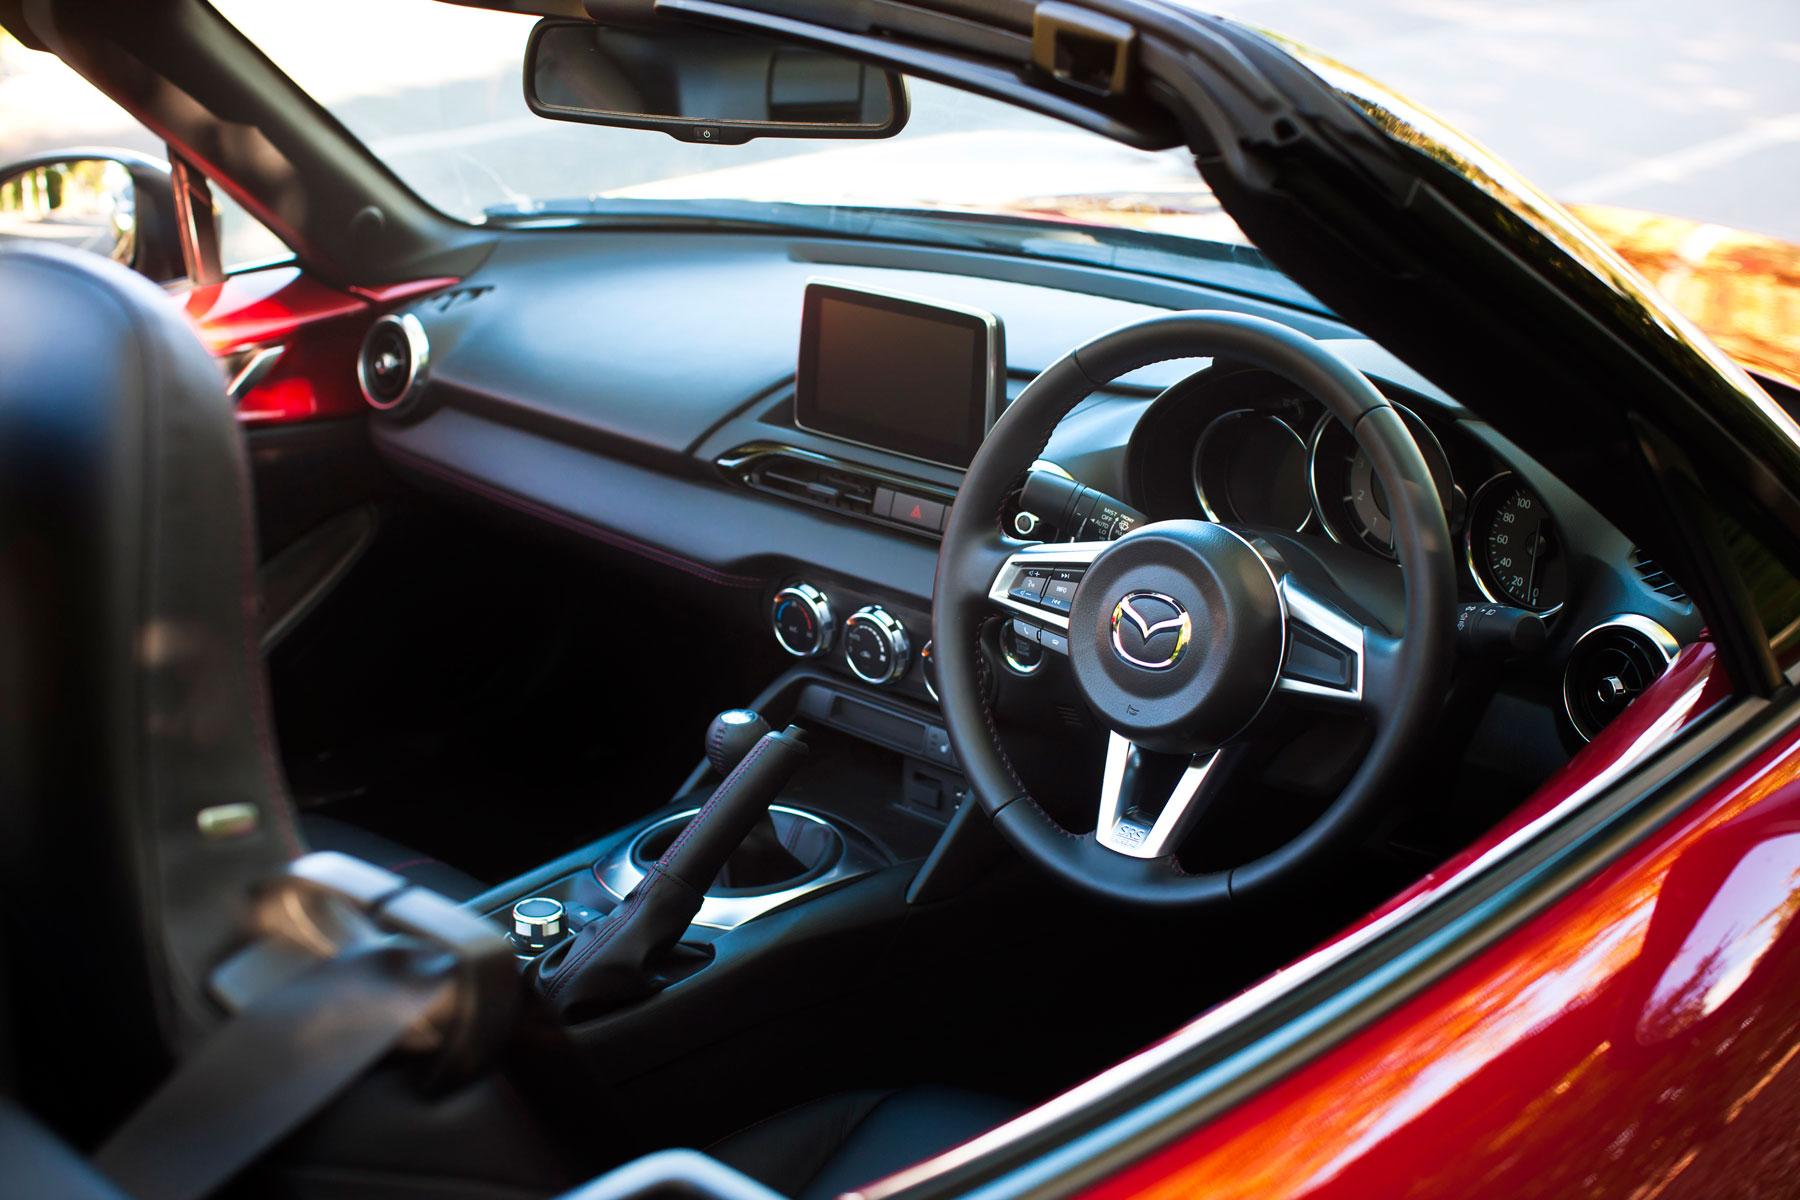 Mazda MX-5: on the inside